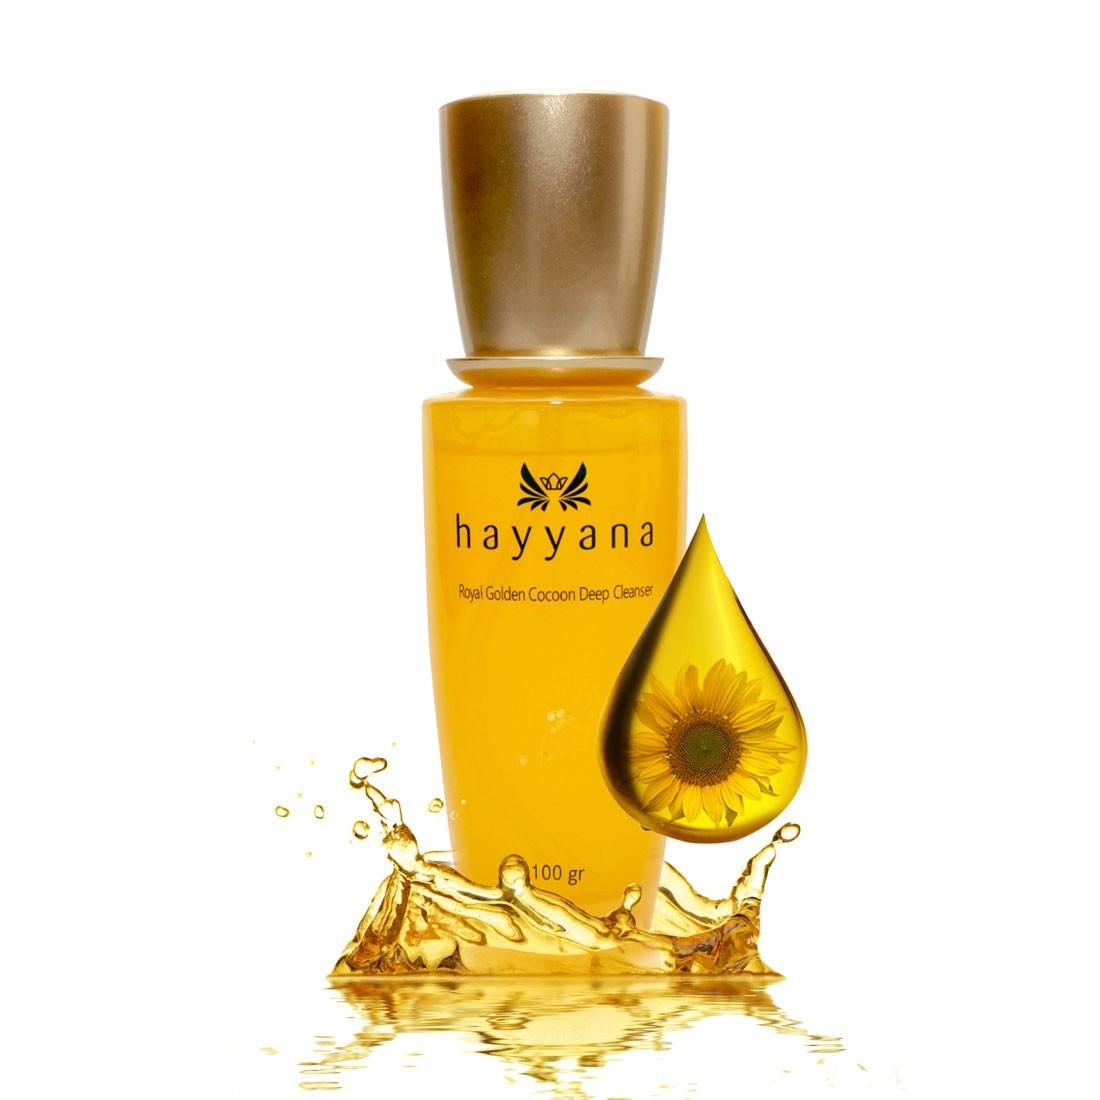 Hayyana  Royal Golden Cocoon Deep Cleanser